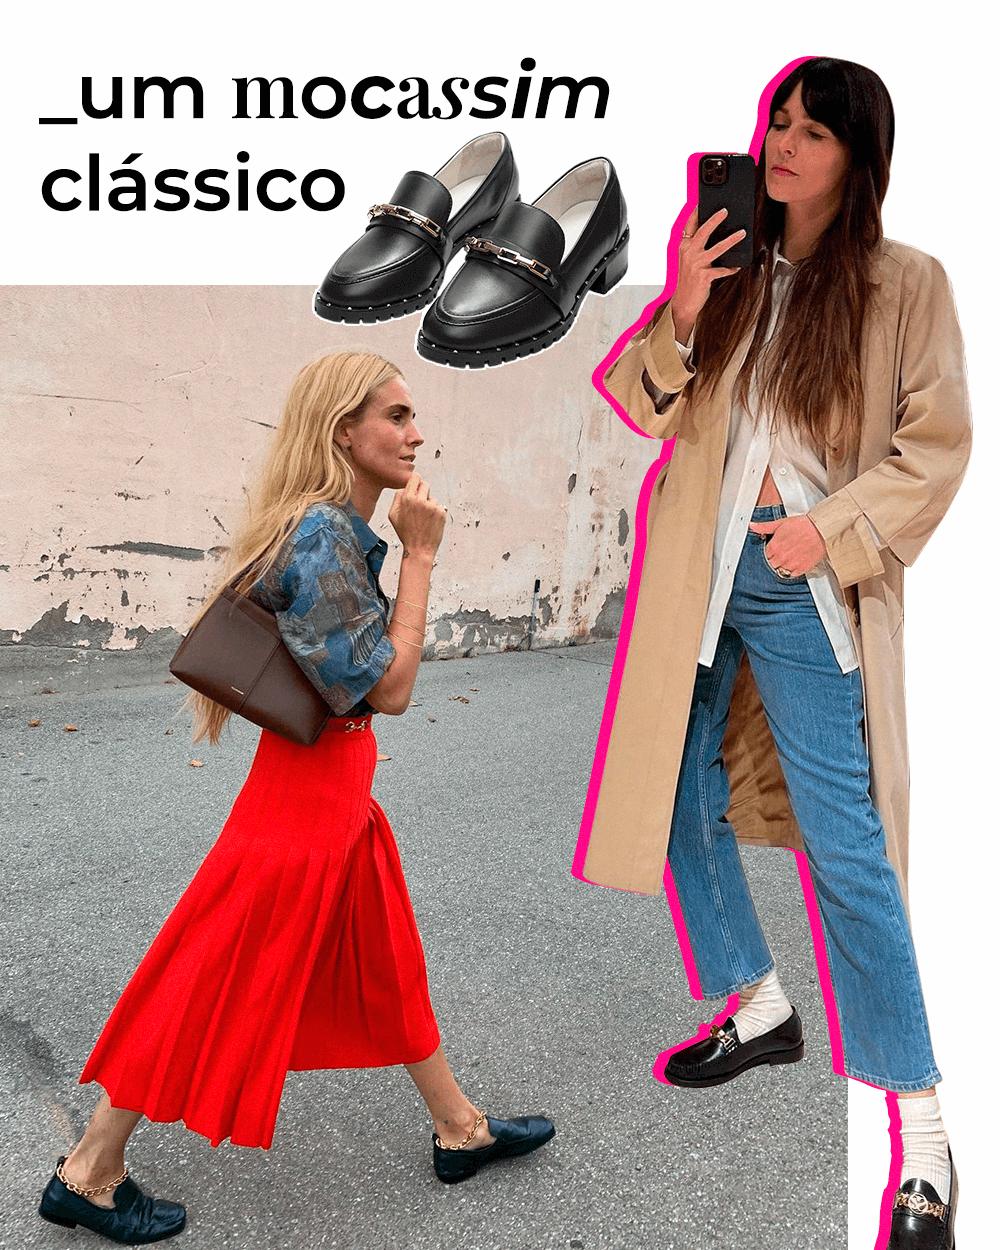 It girls - sapatos de inverno - sapatos de inverno - Inverno - Street Style - https://stealthelook.com.br